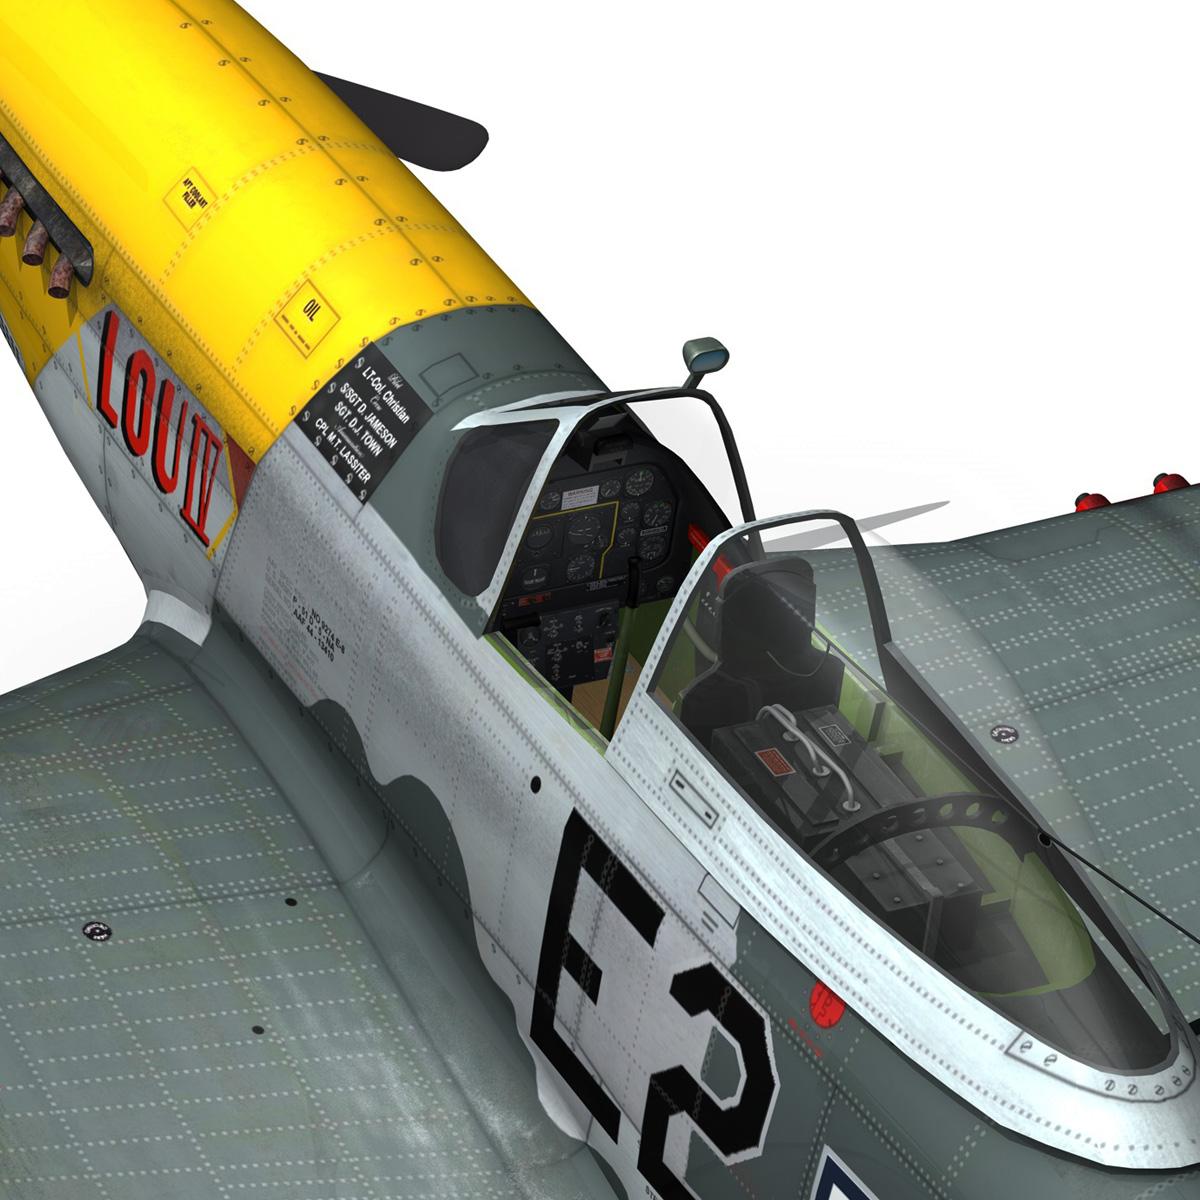 north american p-51d mustang – lou iv 3d model fbx c4d lwo obj 272613